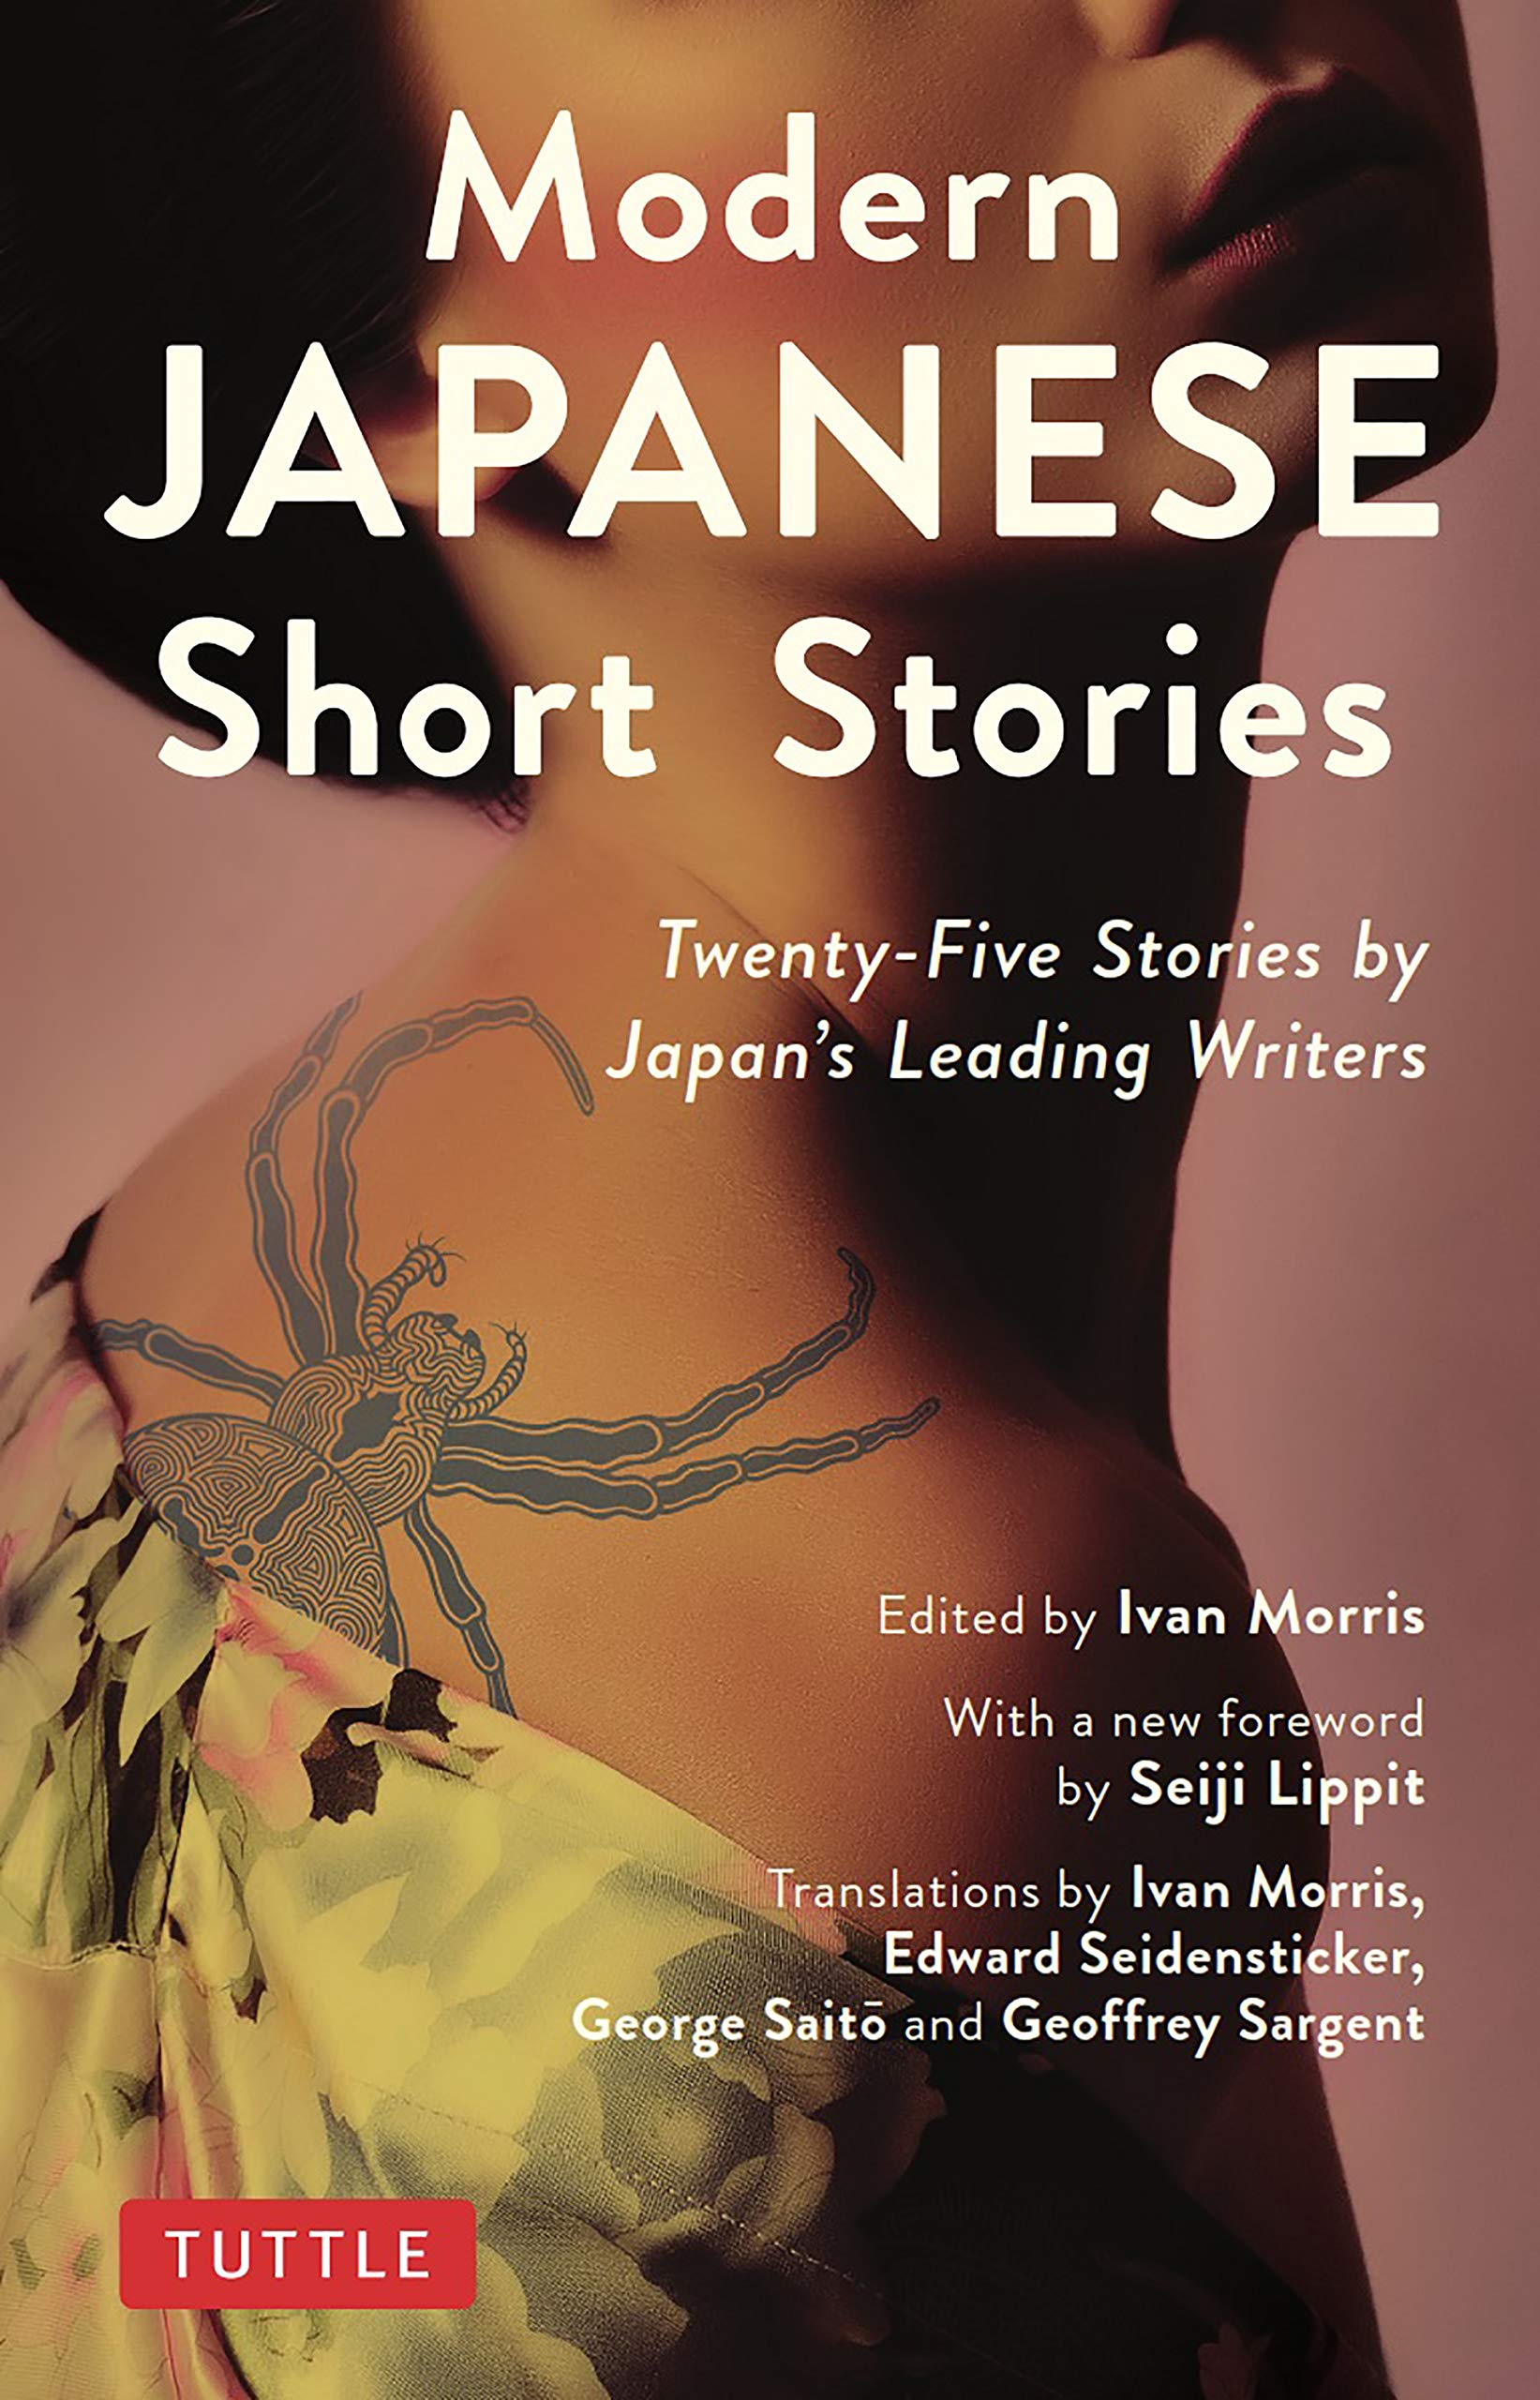 Modern Japanese Short Stories: Twenty-Five Stories by Japan's Leading Writers